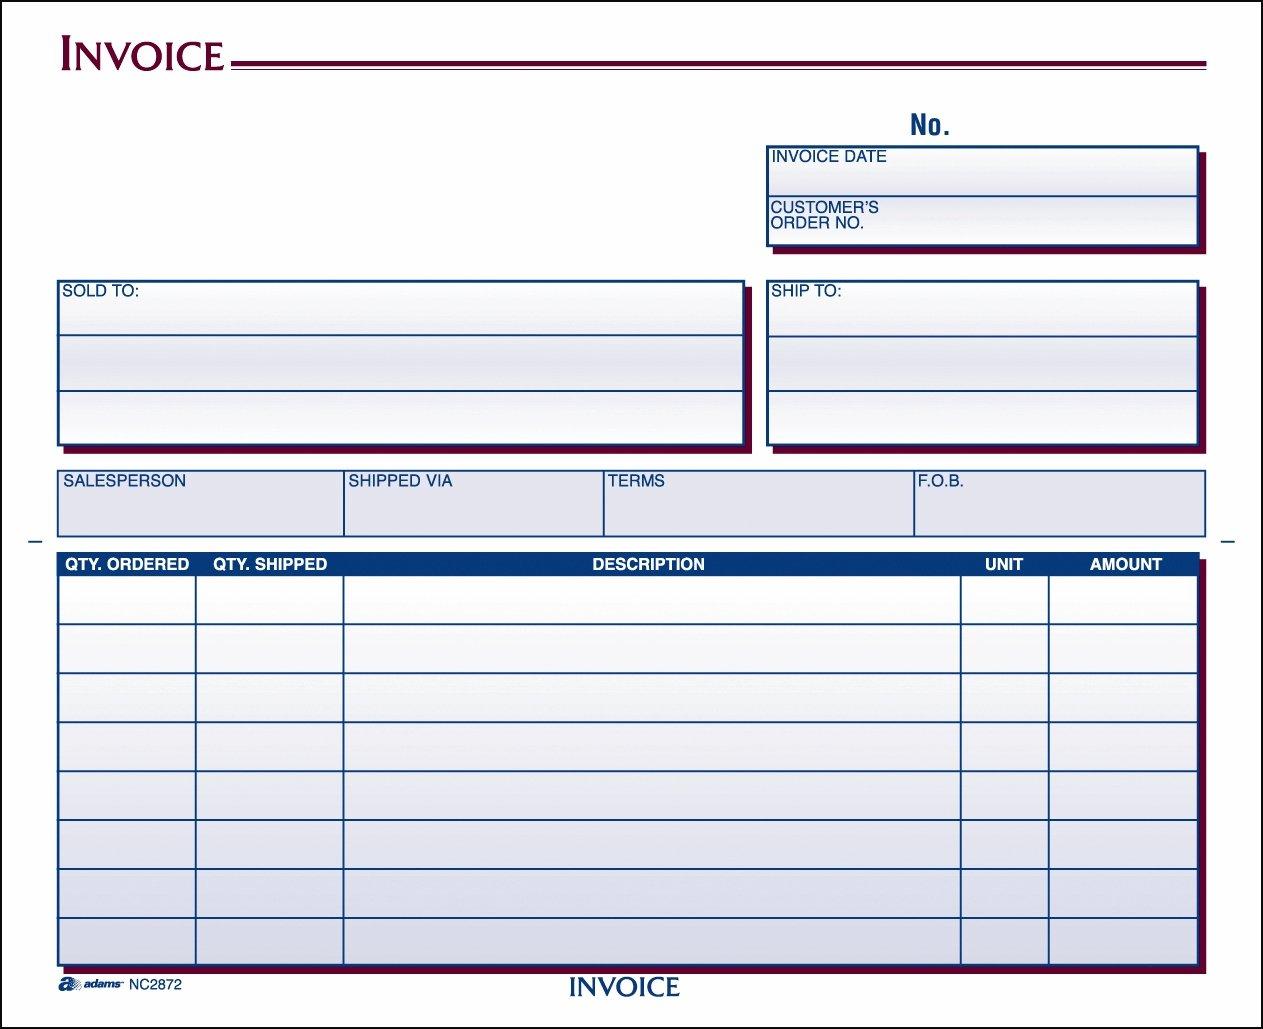 Amazoncom Adams Invoice Unit Set X Inch Part - Adams invoice dc5840